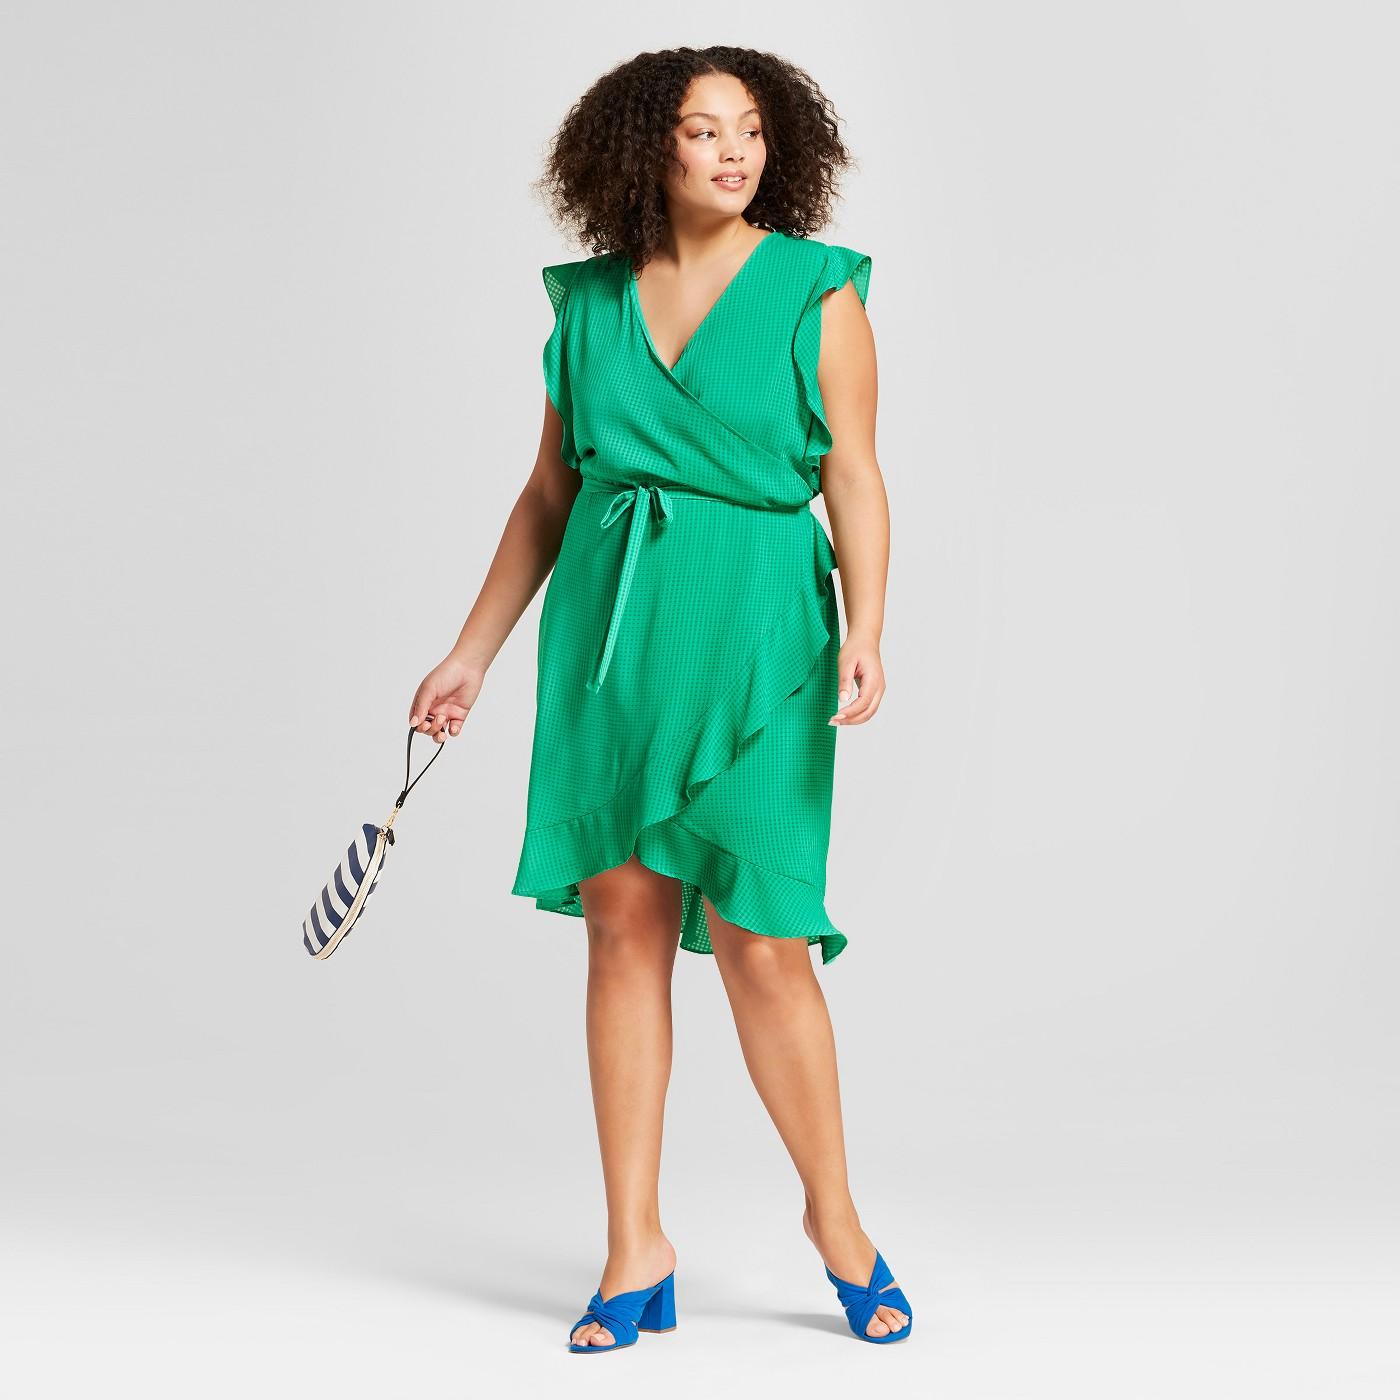 Plus Size Dresses   Stylish Curves